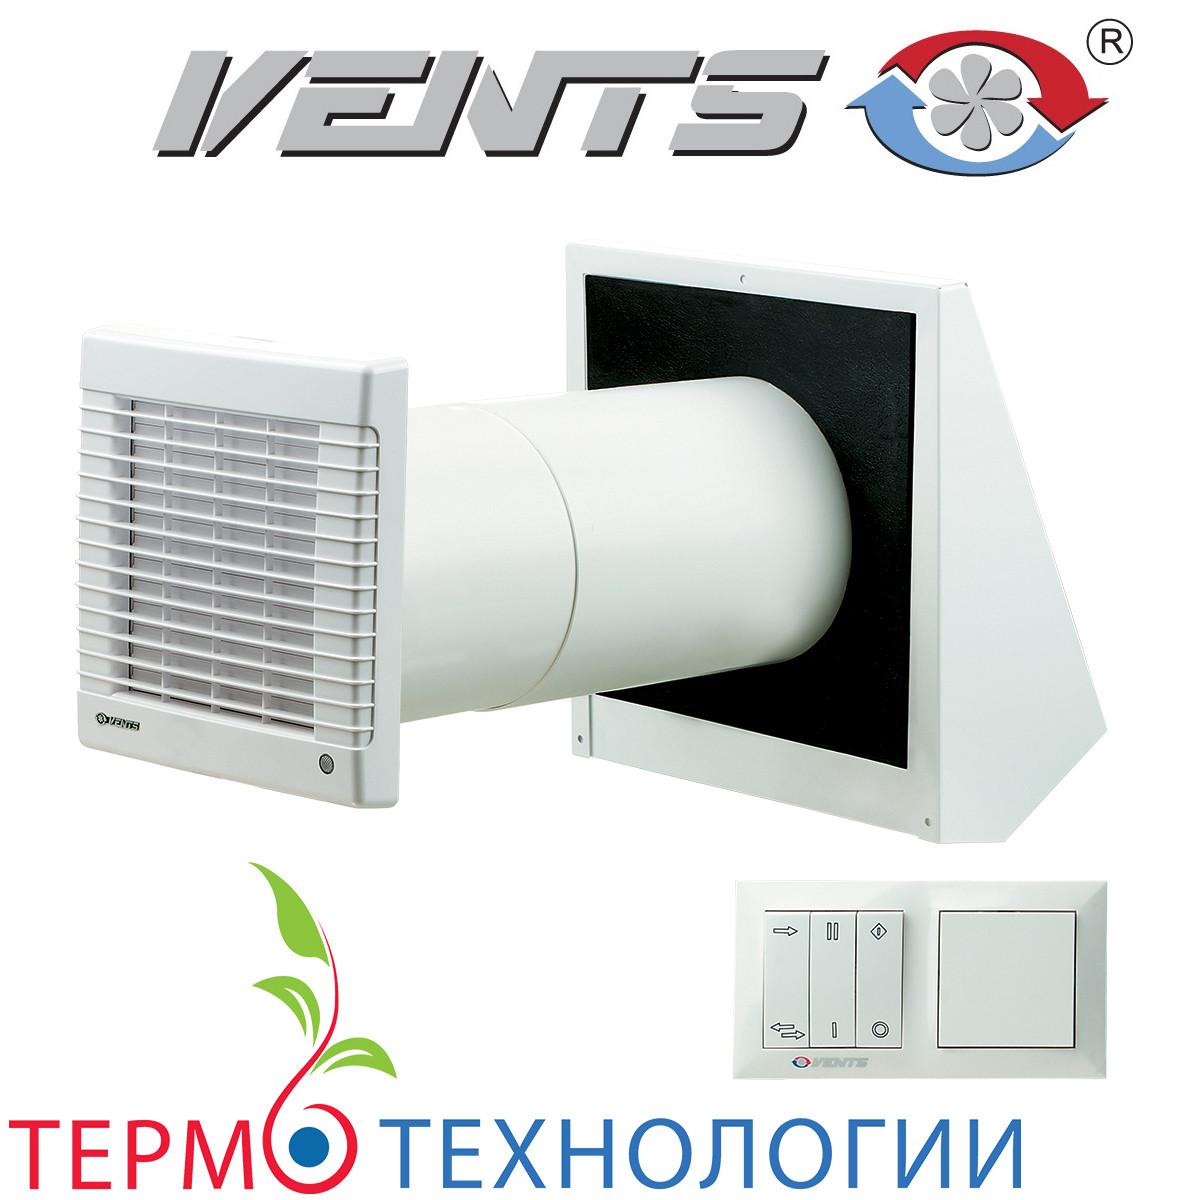 Рекуператор Vents ТвинФреш для вентиляции помещения до 25 м.кв.